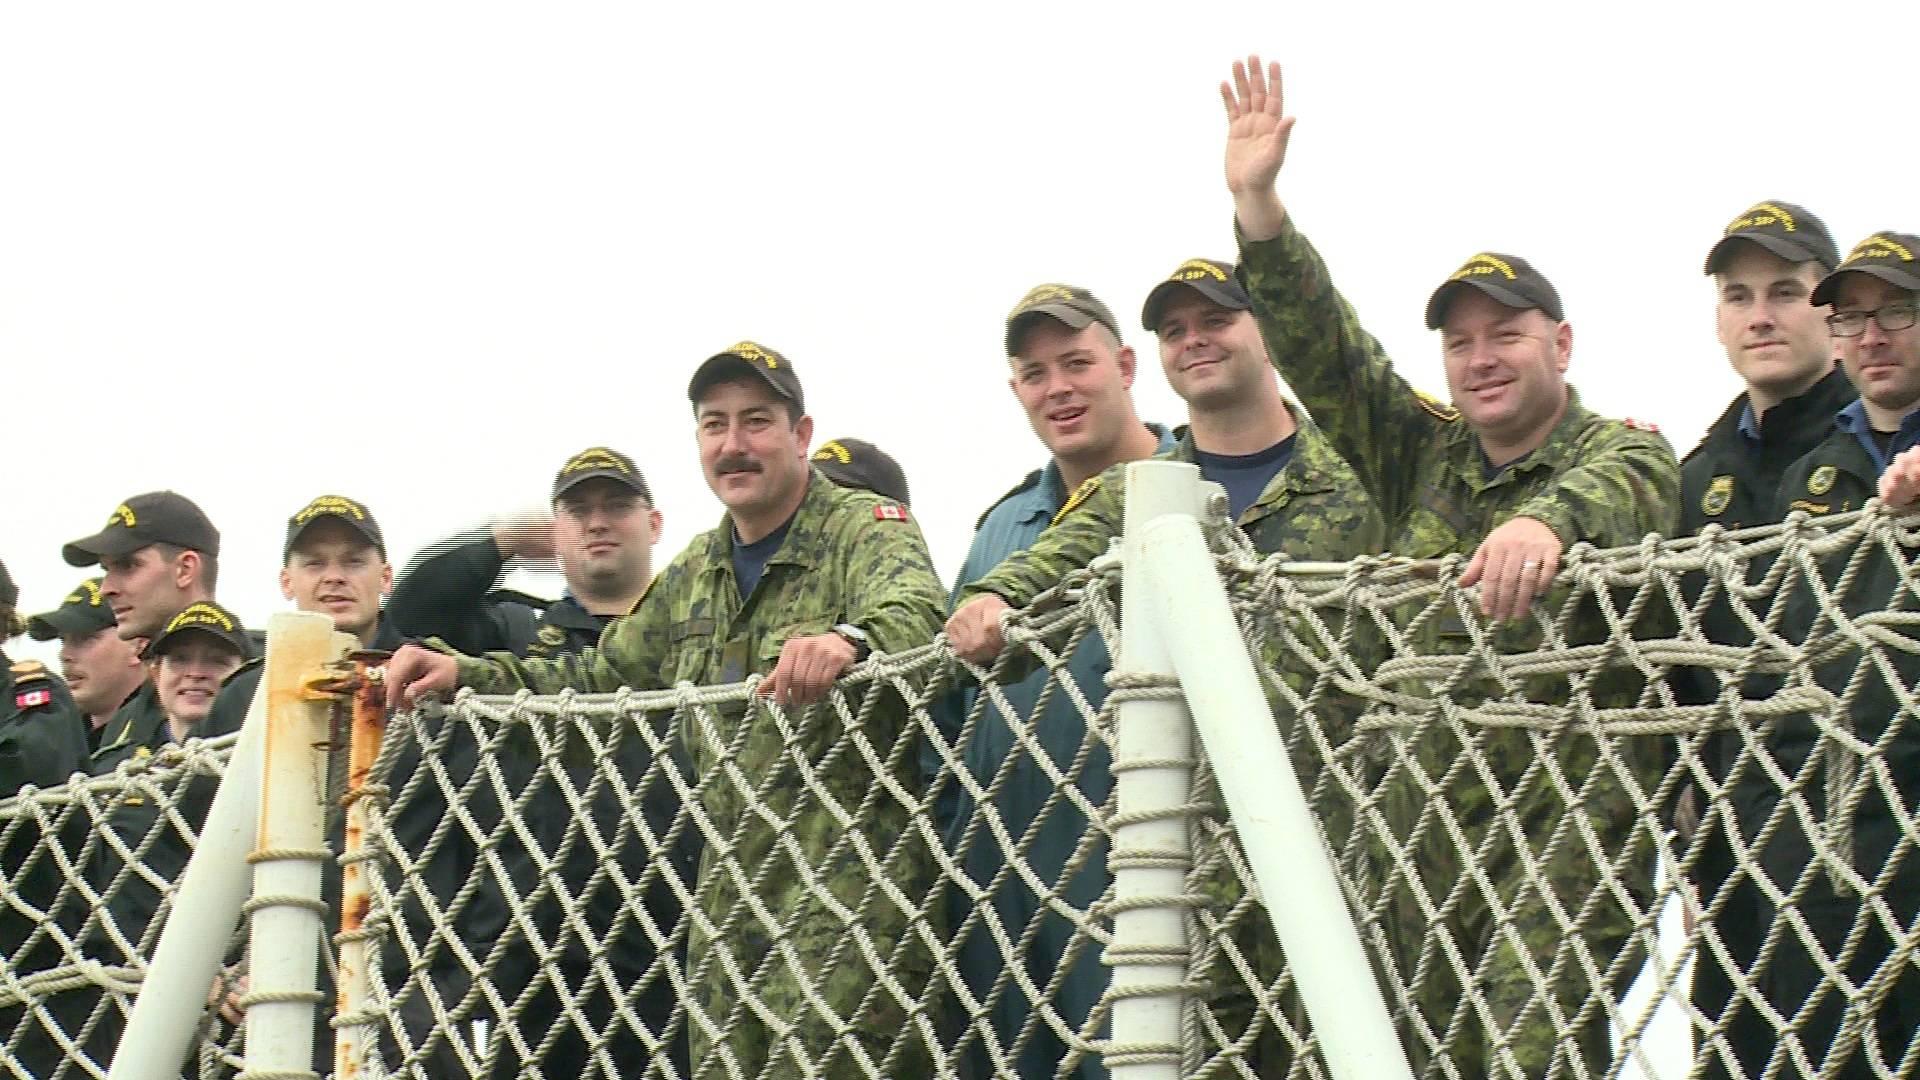 HMCS Fredericton continues Mediterranean mission amid COVID-19